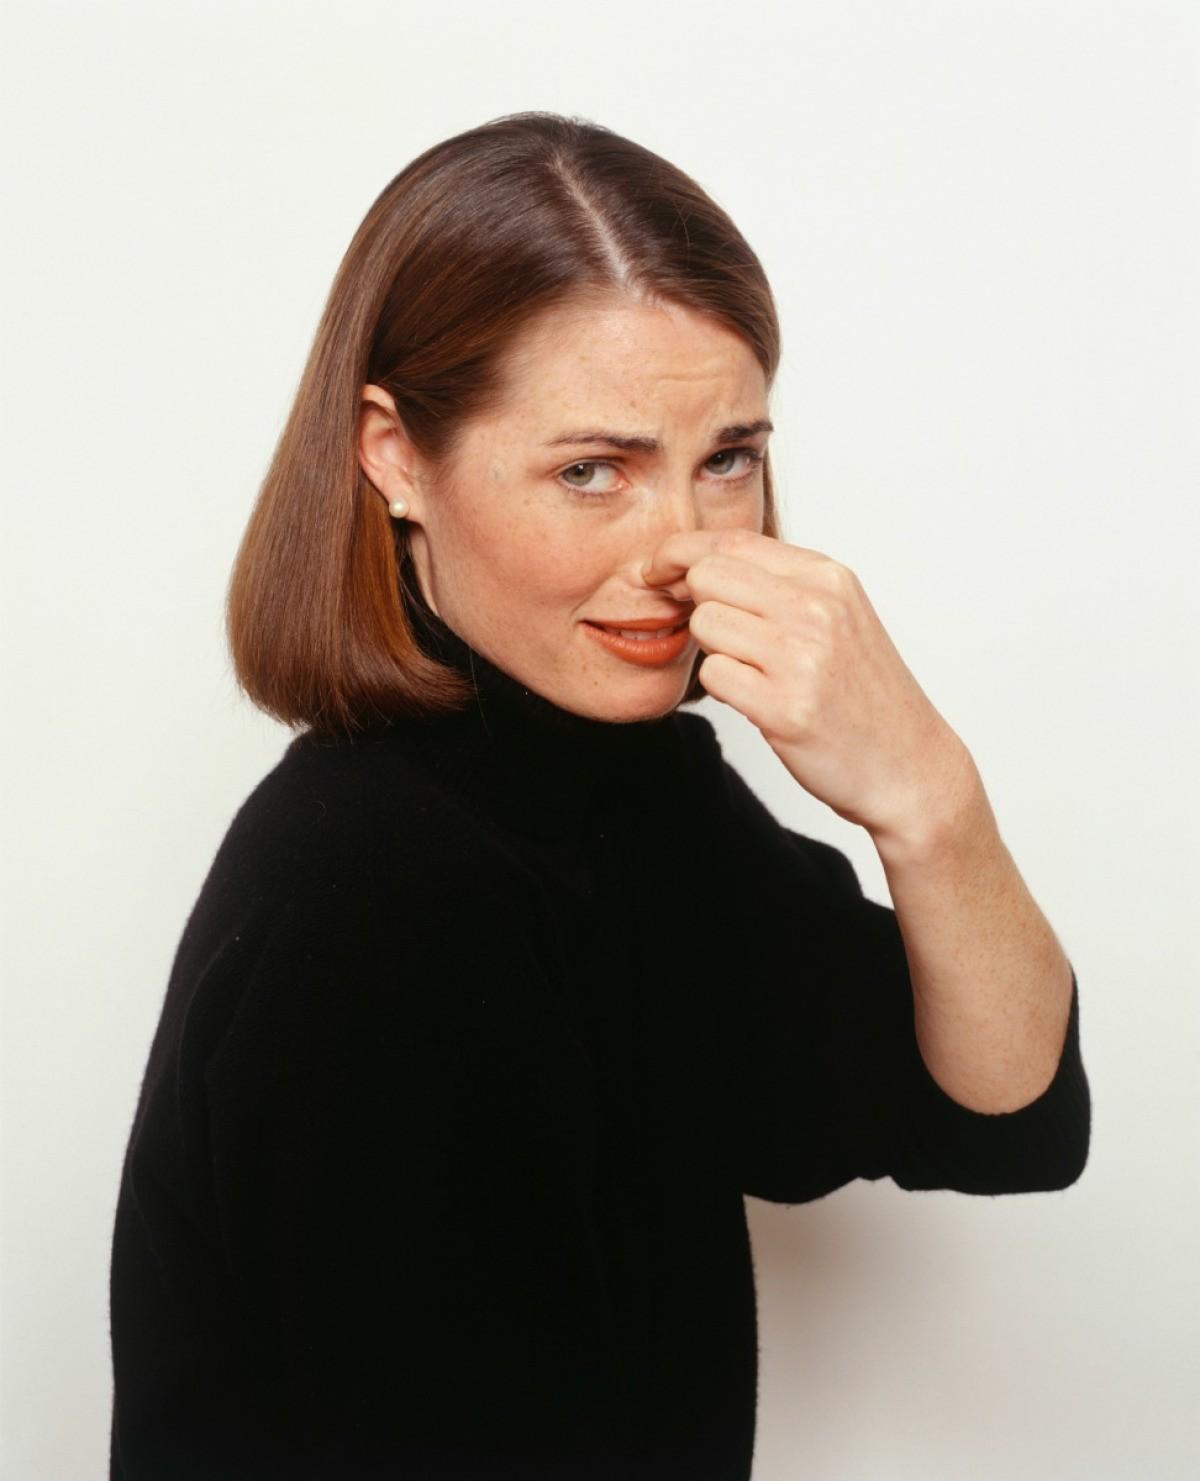 Getting Rid Of Urine Odors